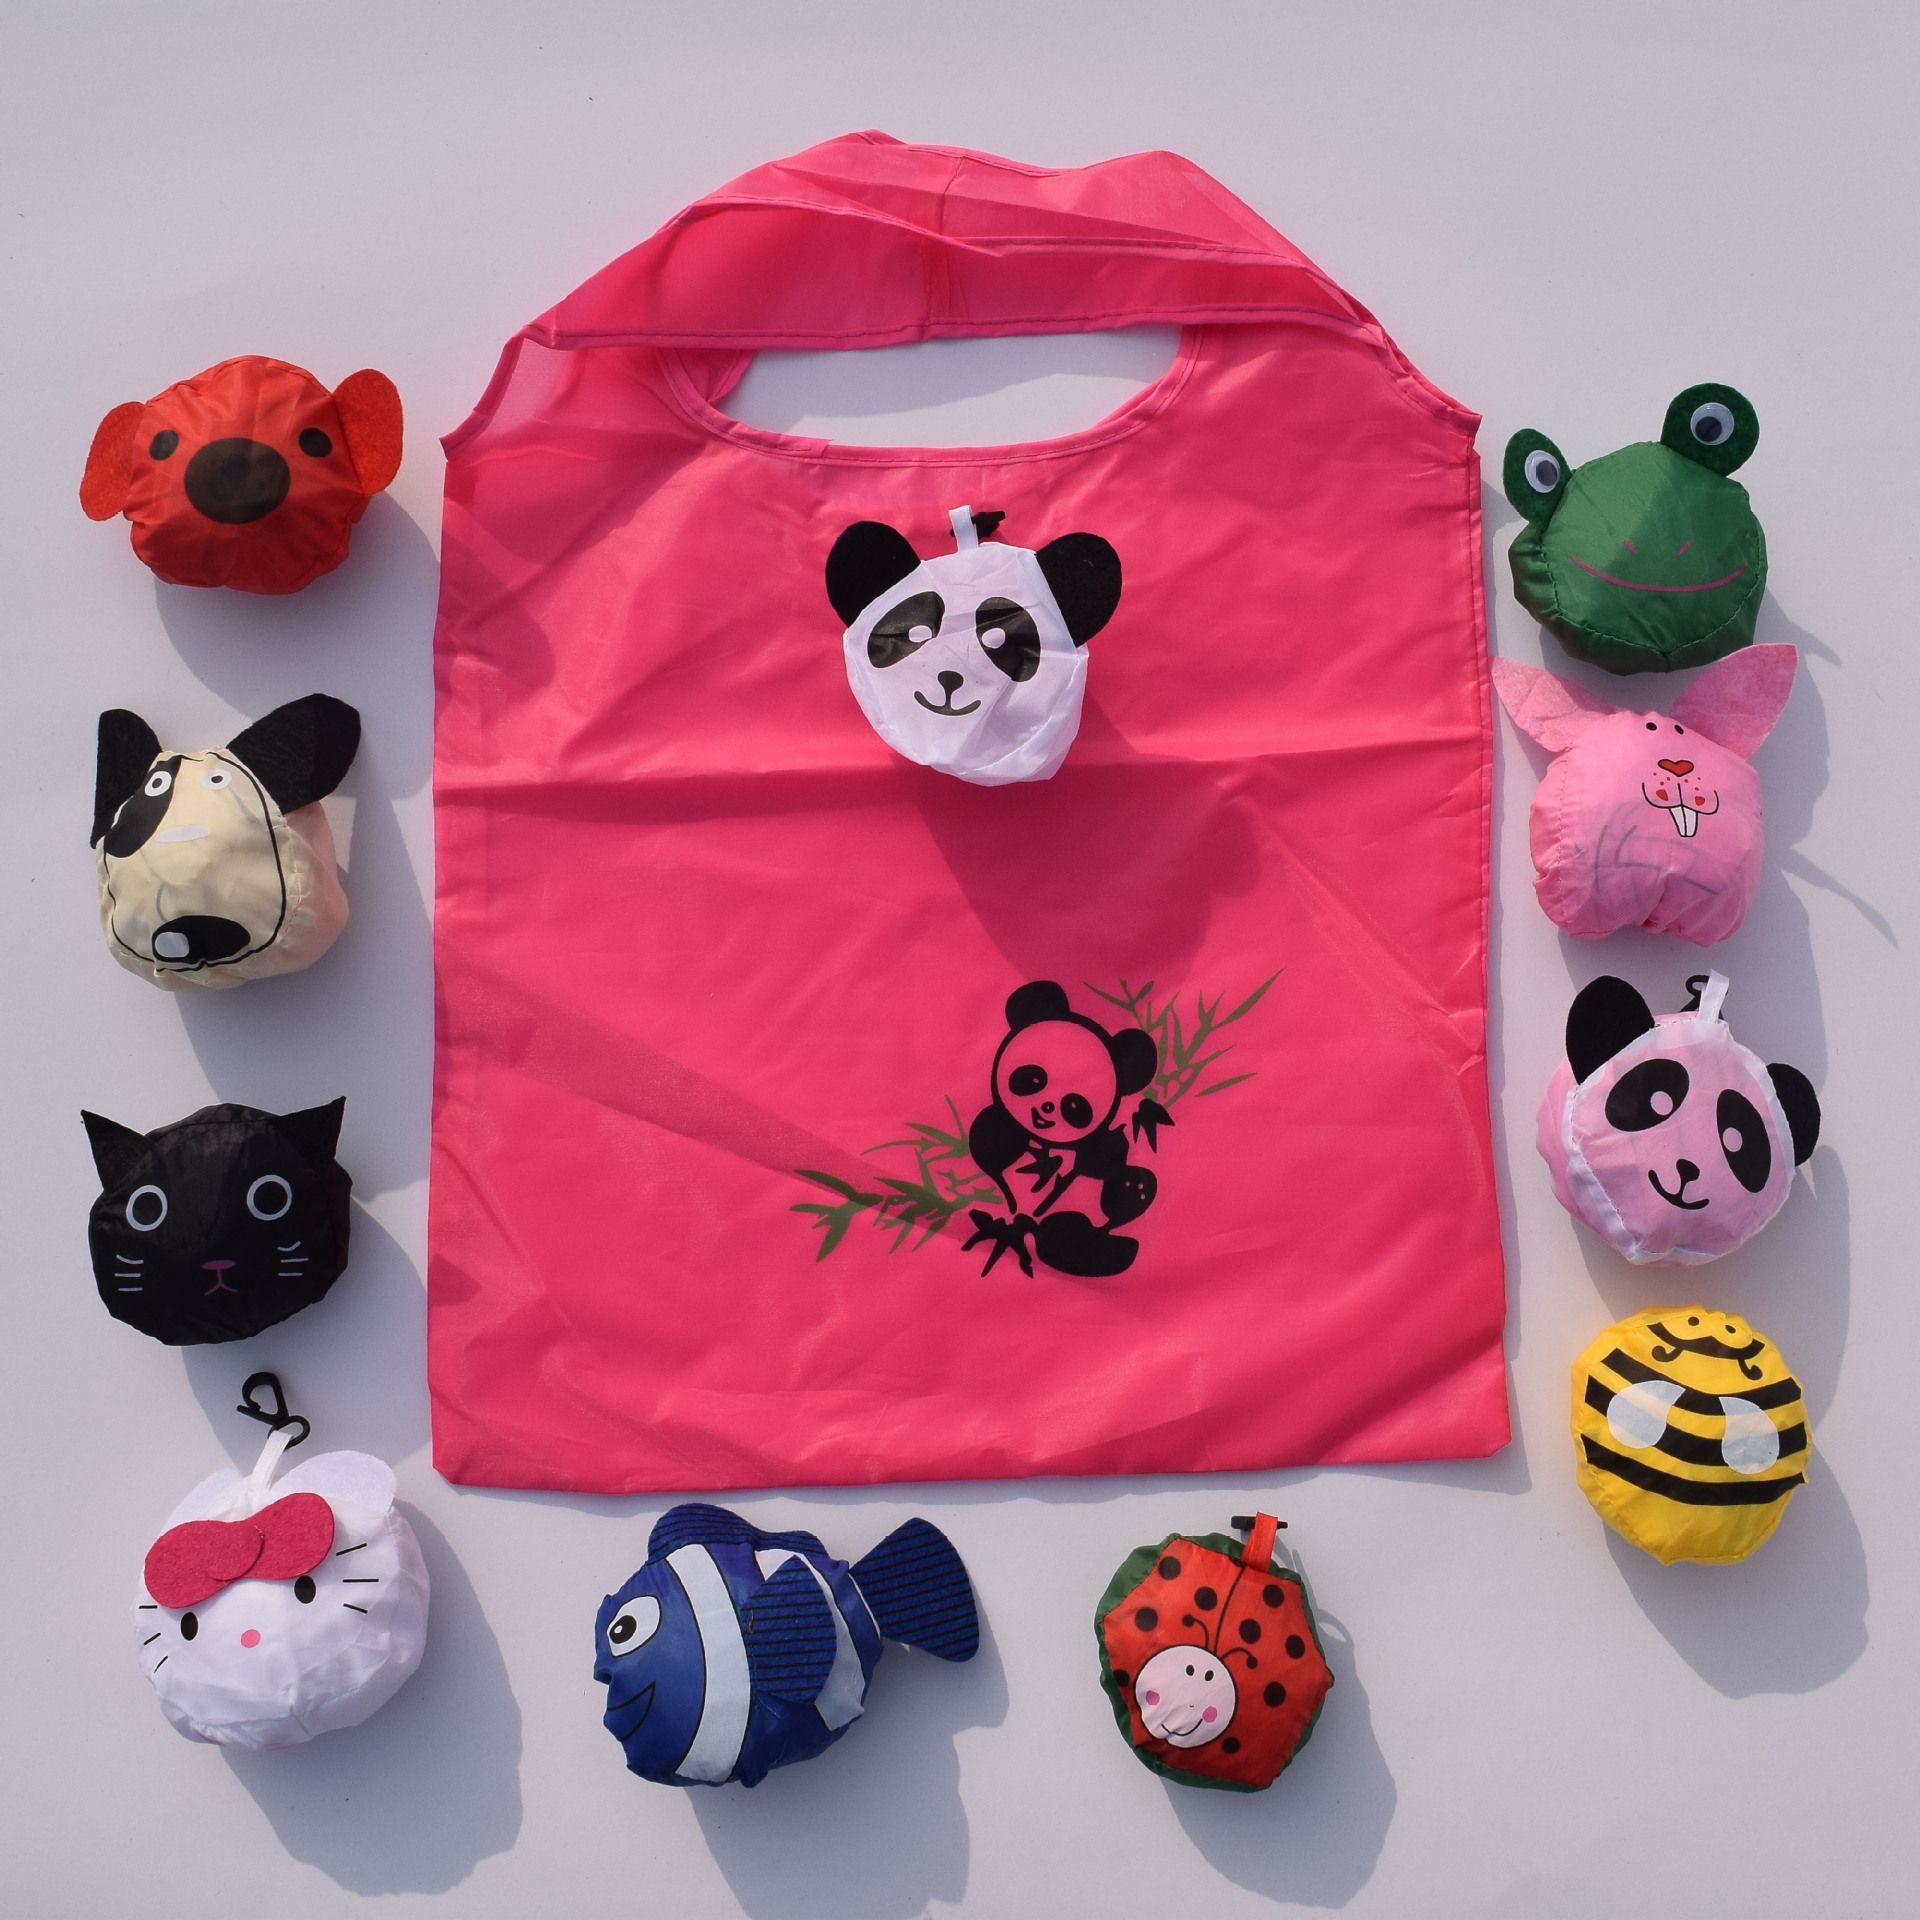 Reusable Fruit & Animal Folding Shopping Bag Foldable Eco Nylon Bags Tote Carrier Environmentally Friendly Tote Bag